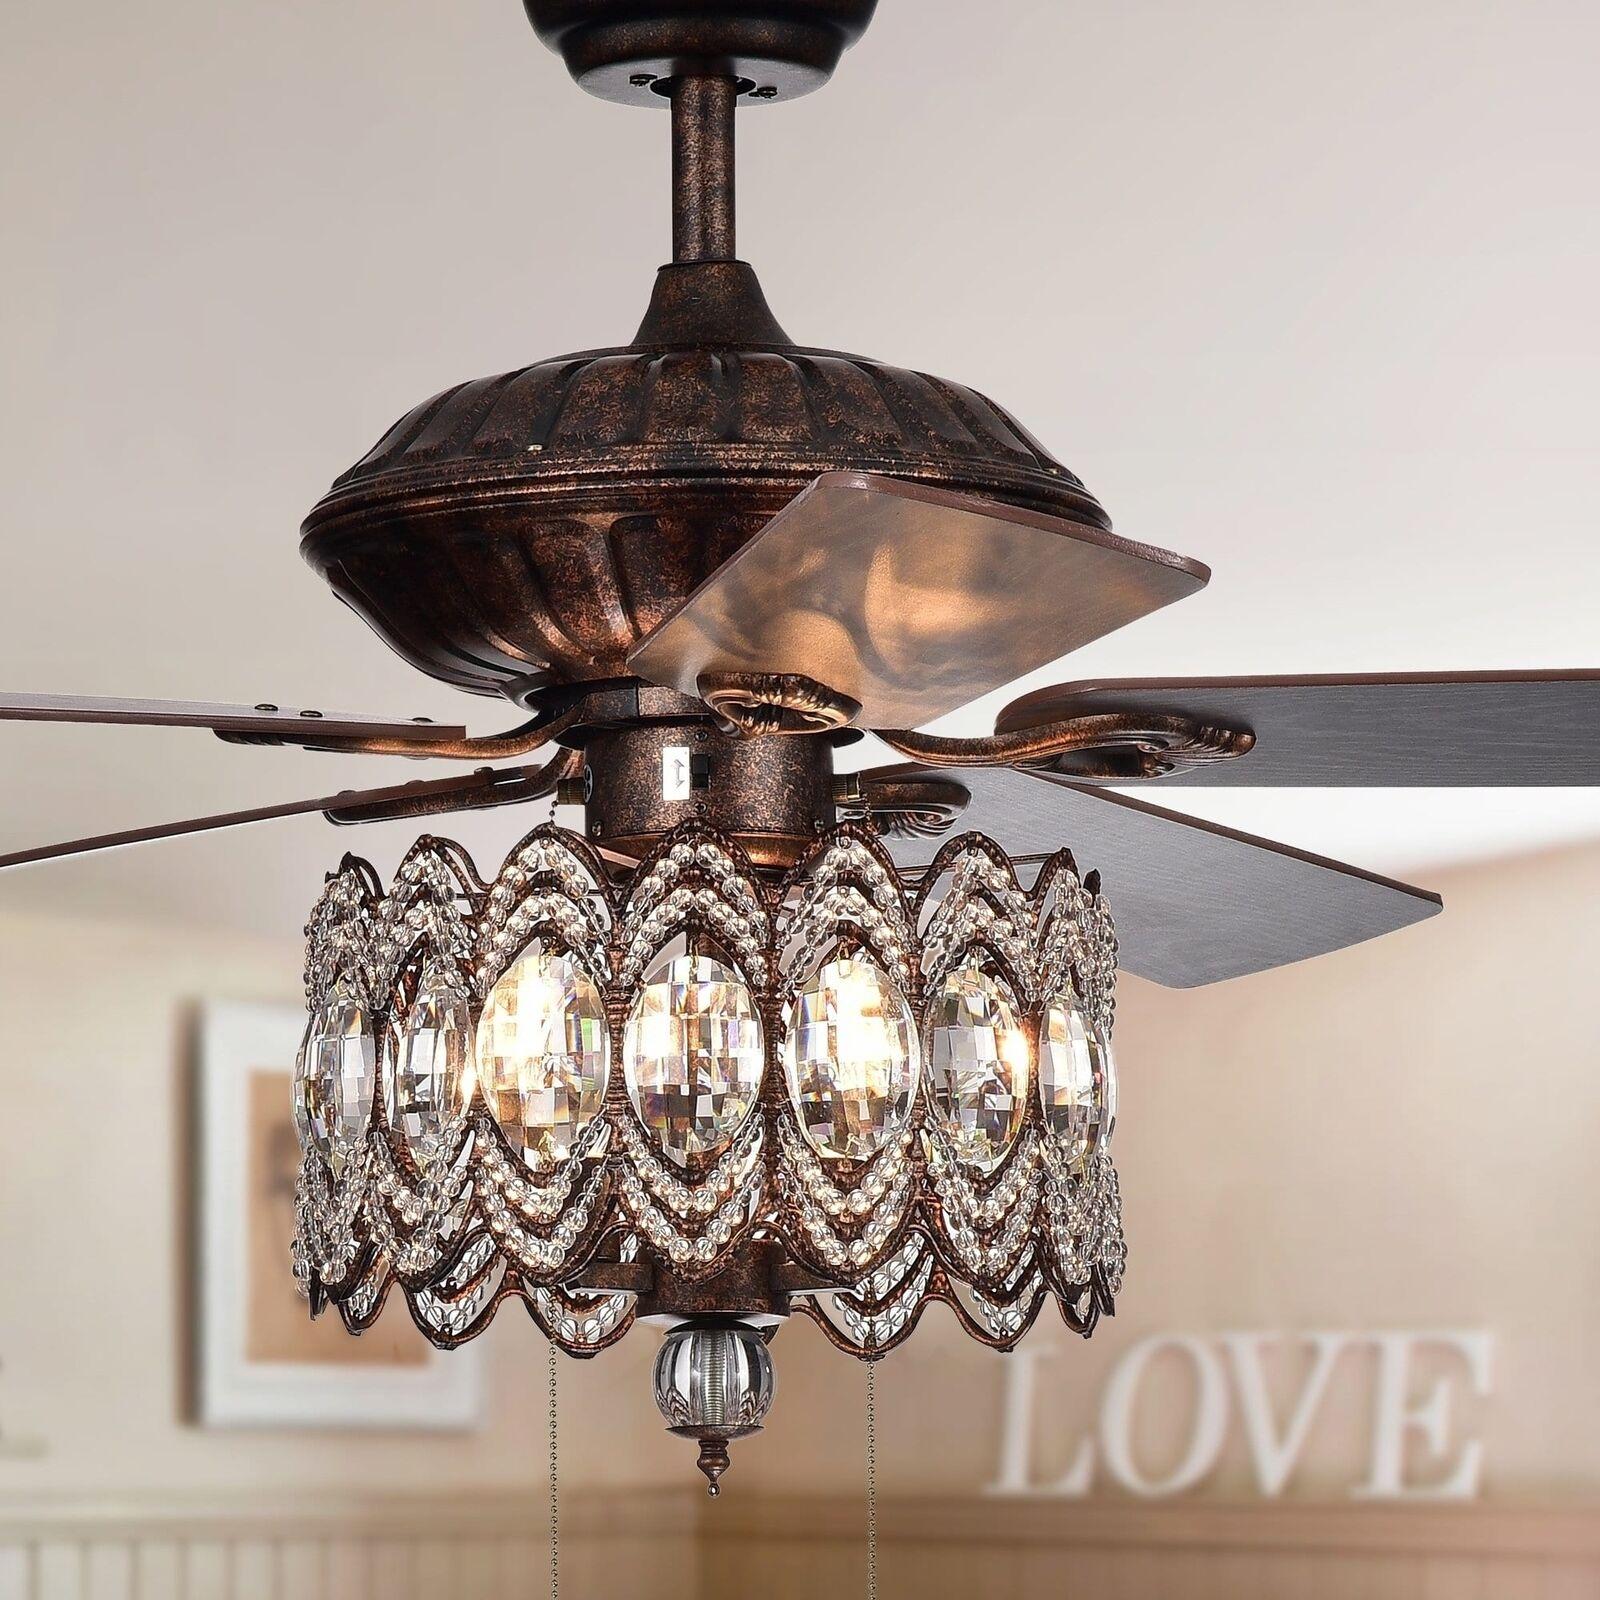 Mariposa 52 inch rustic bronze chandelier ceiling fan wtih crystal shade